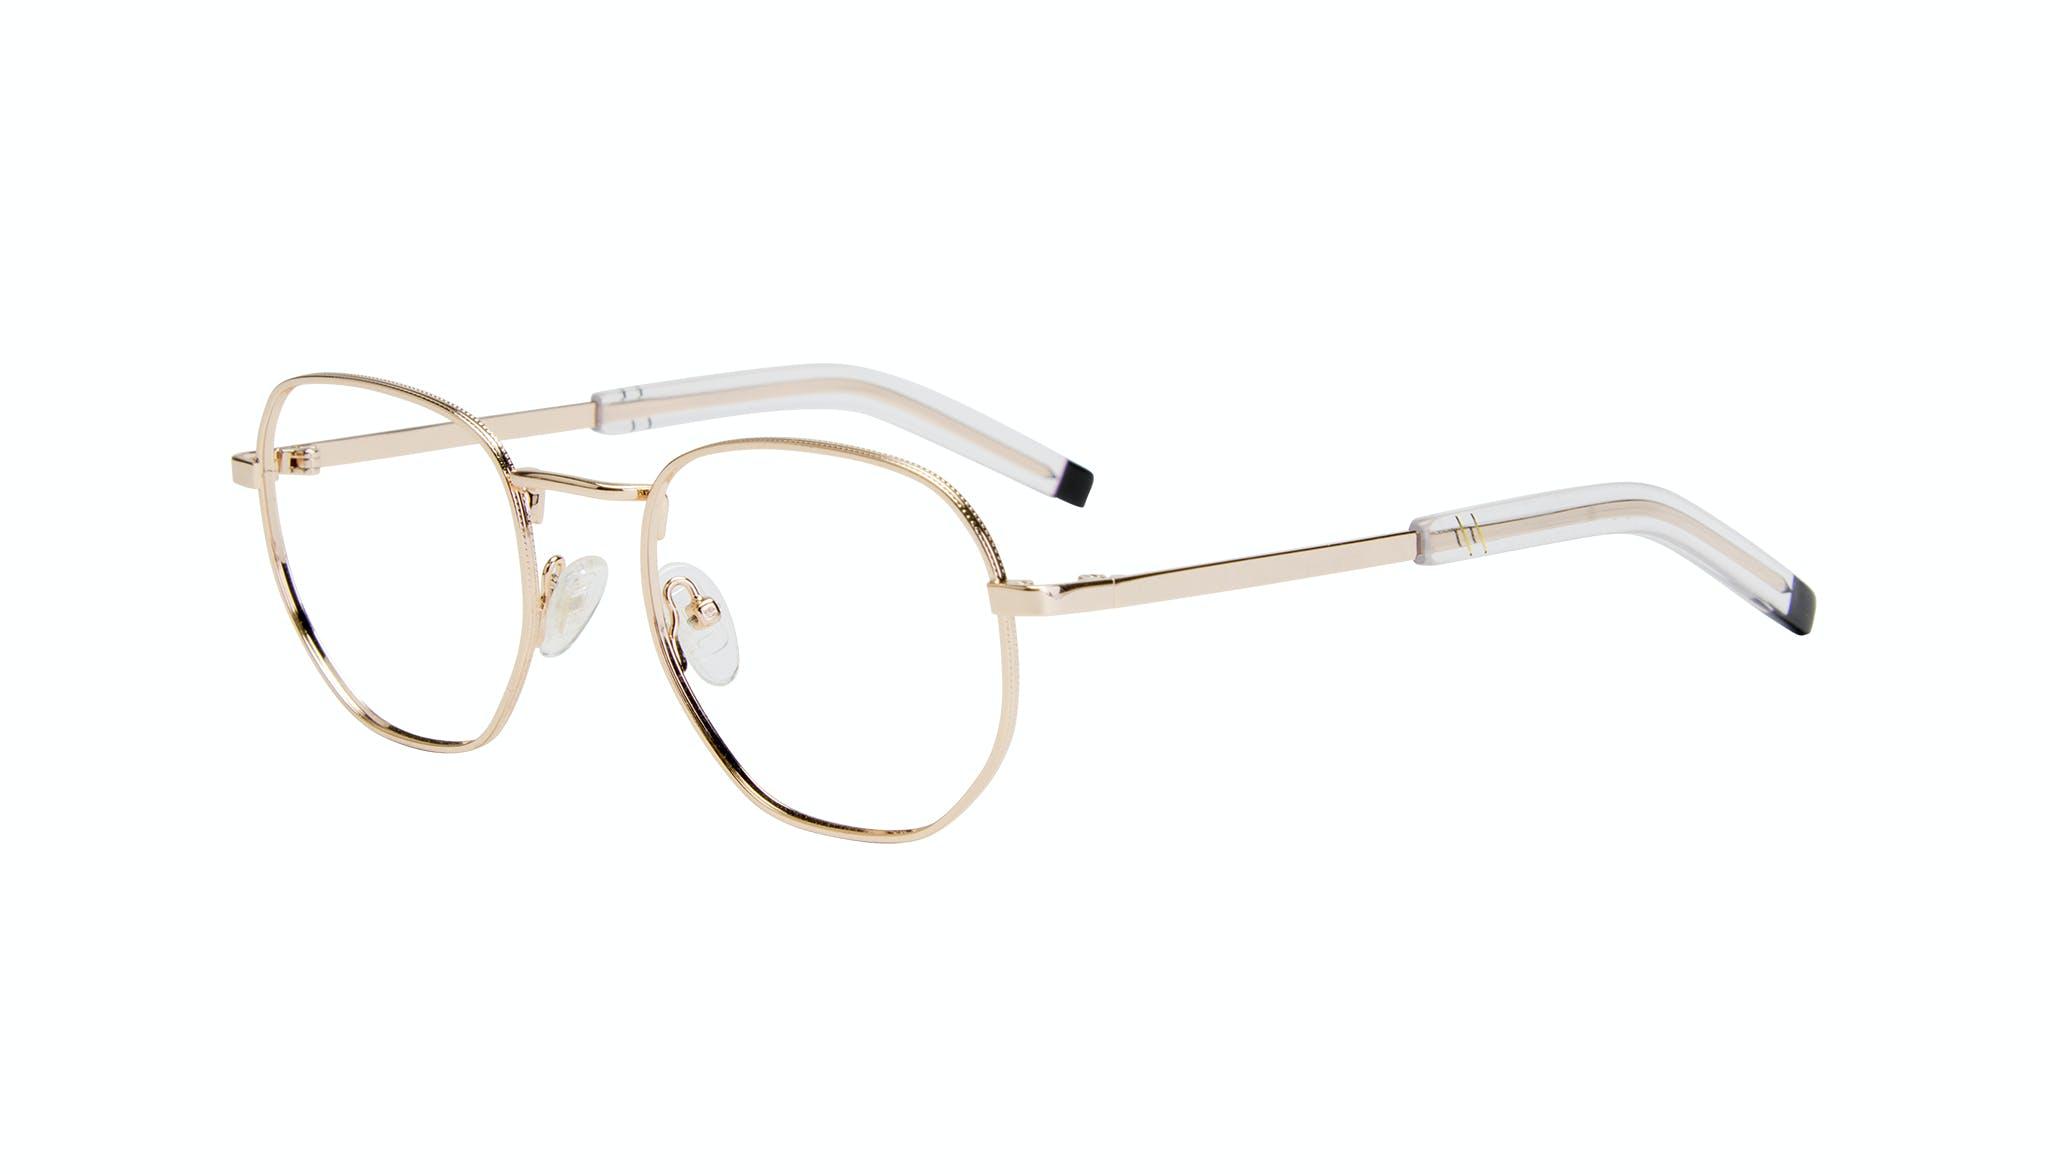 Affordable Fashion Glasses Round Eyeglasses Men Rise Gold Tilt